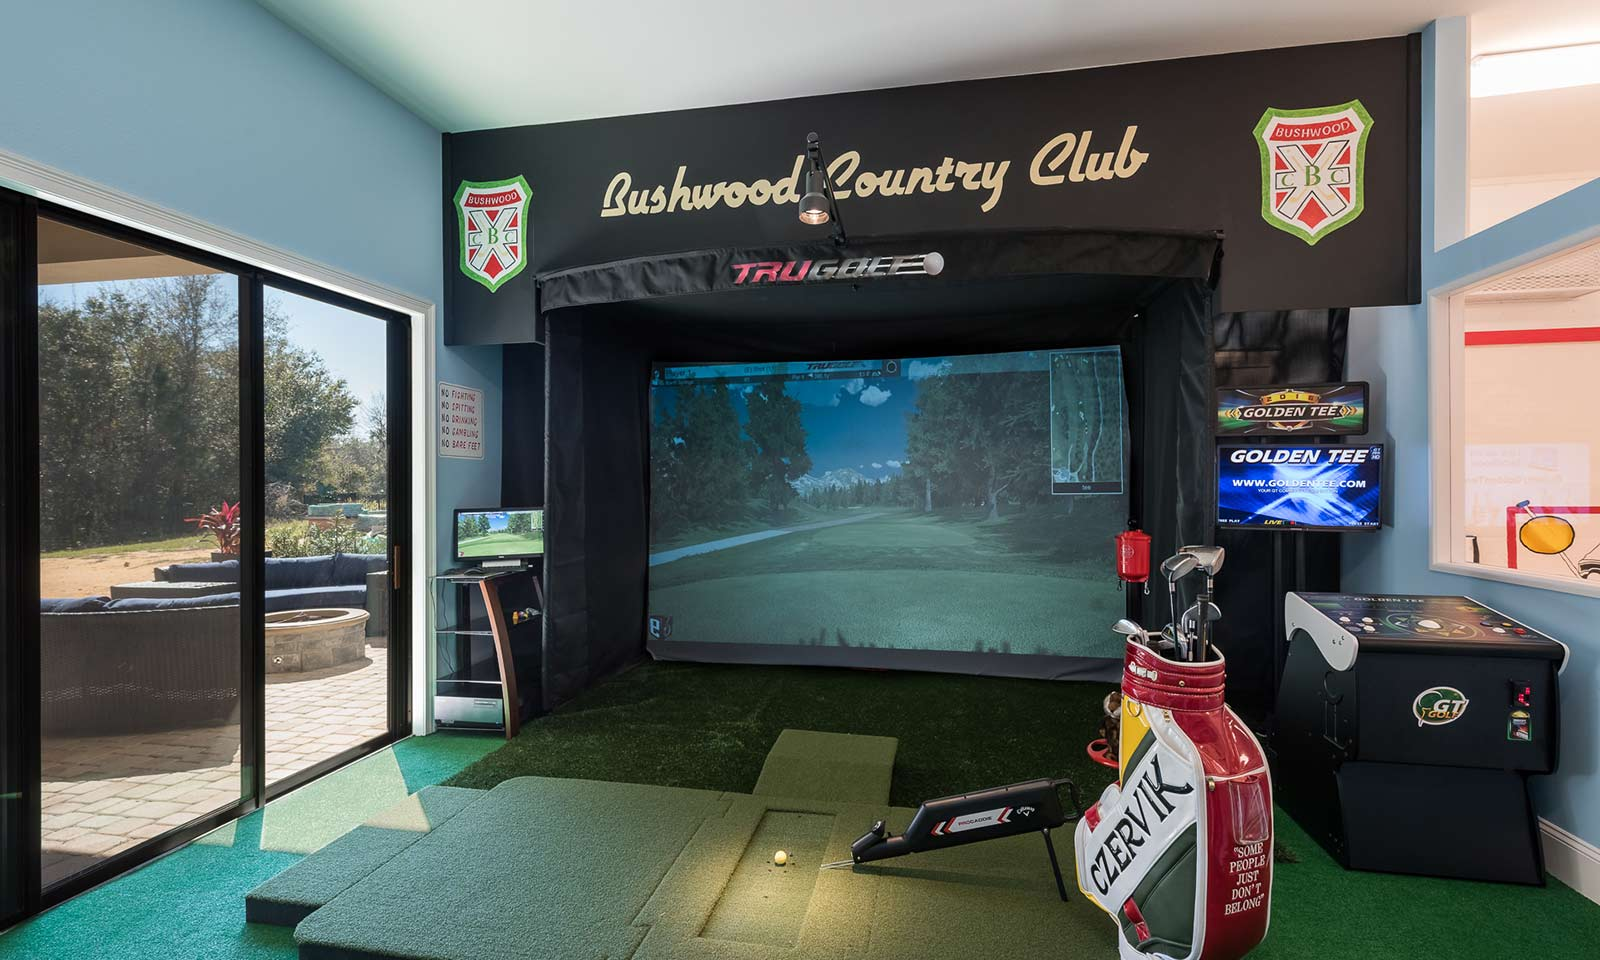 [amenities:Golf-Simulator:1] Golf Simulator